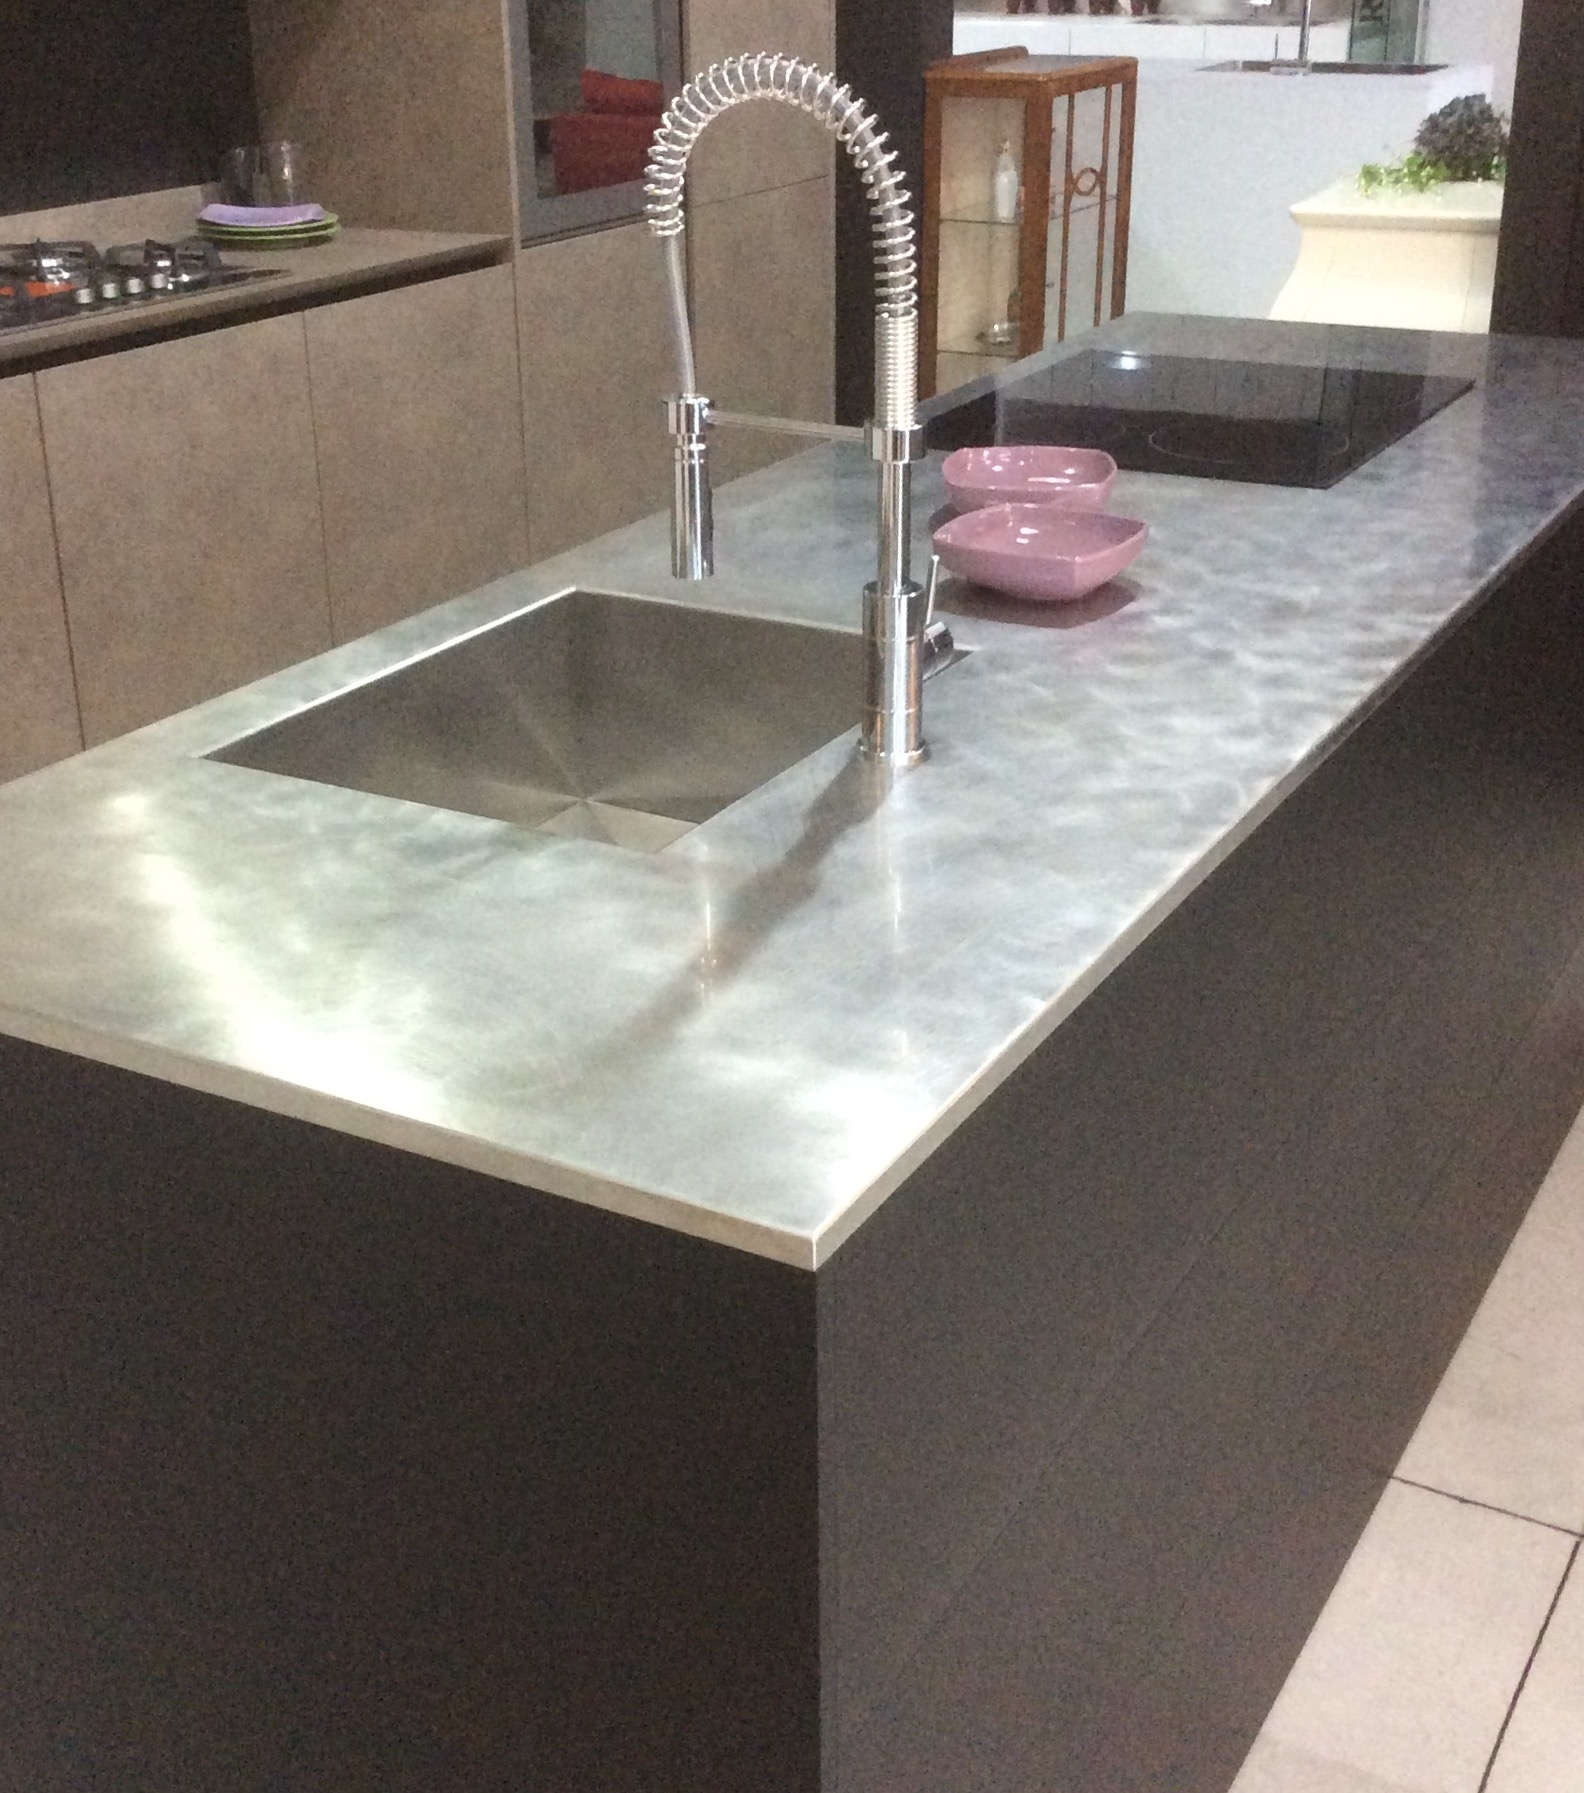 Zampieri cucine isola mod cucine a prezzi scontati - Top cucina acciaio prezzi ...